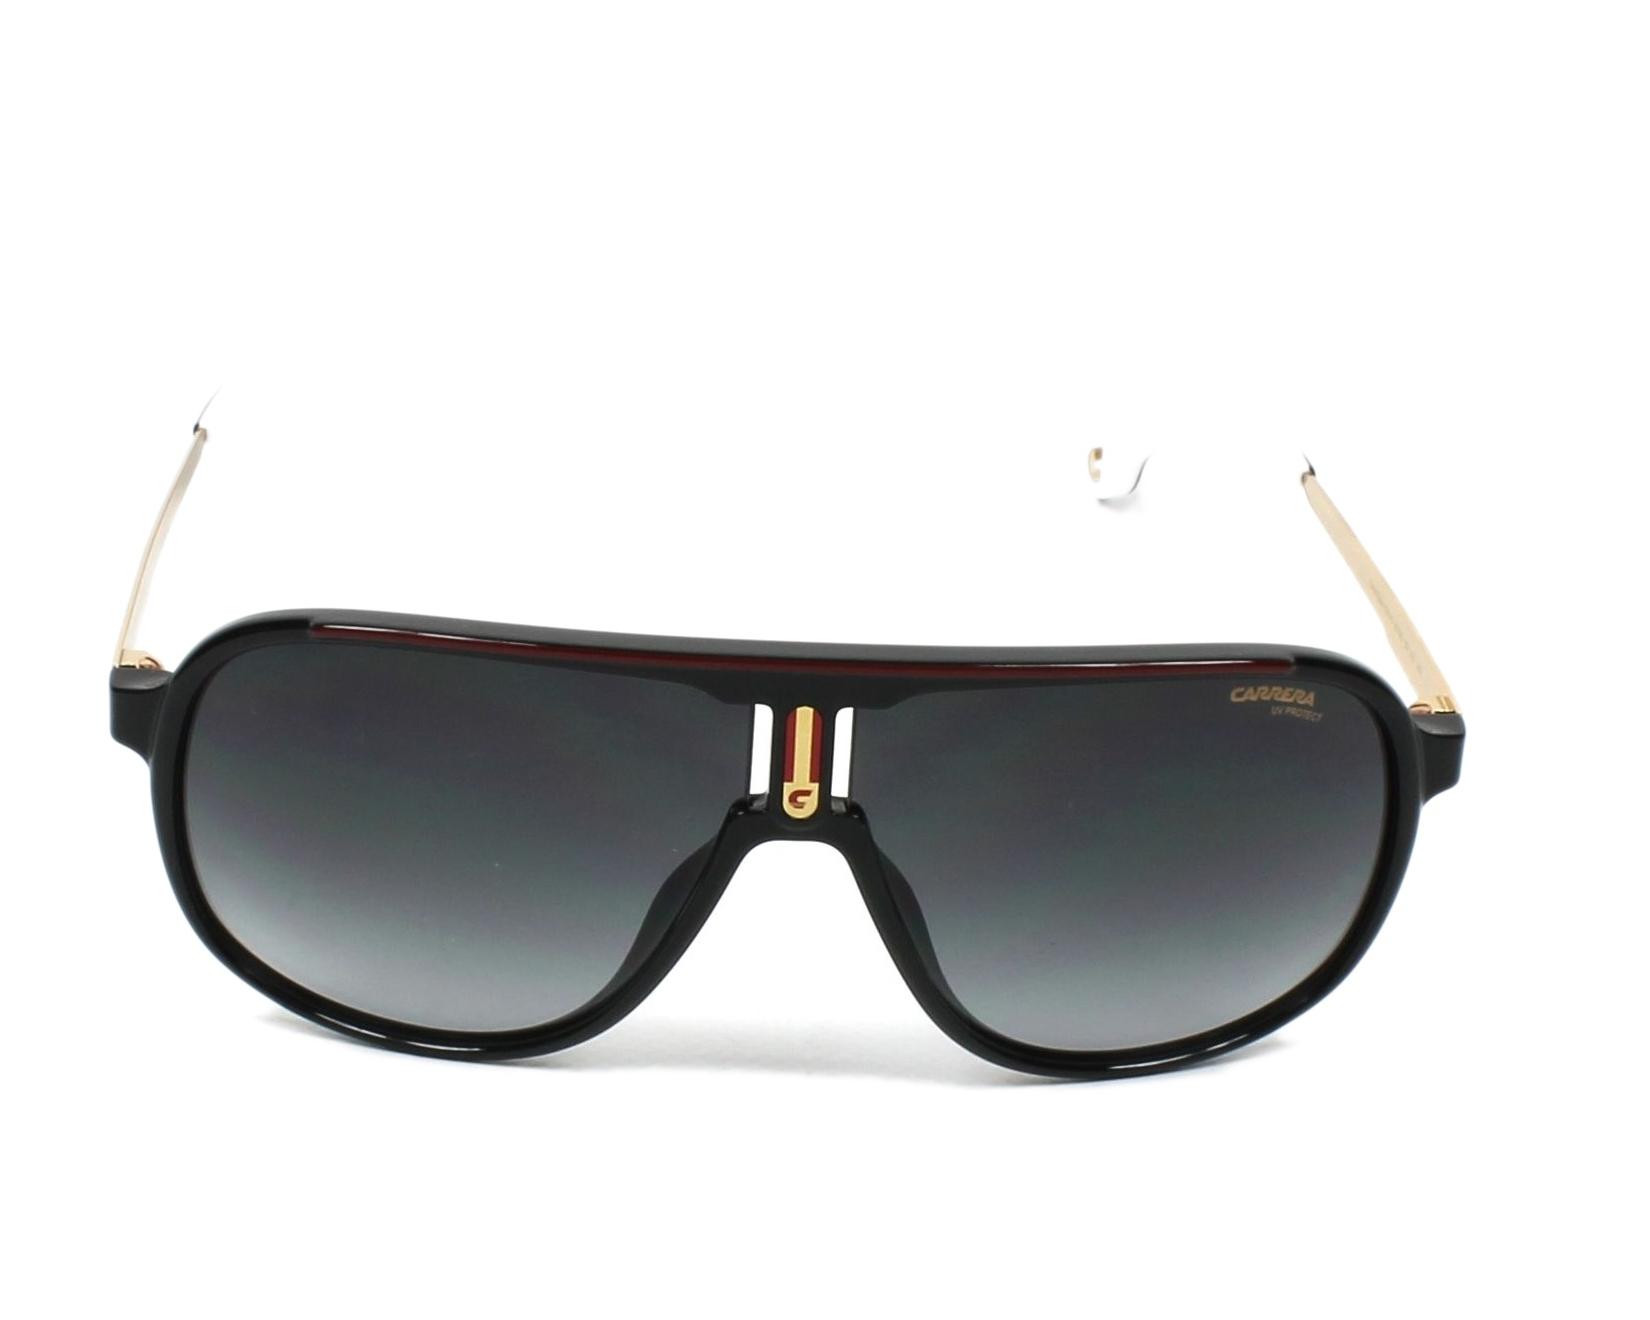 46477b01ecc3c Sunglasses Carrera 1007-S 807 9O 62-10 Black Gold front view